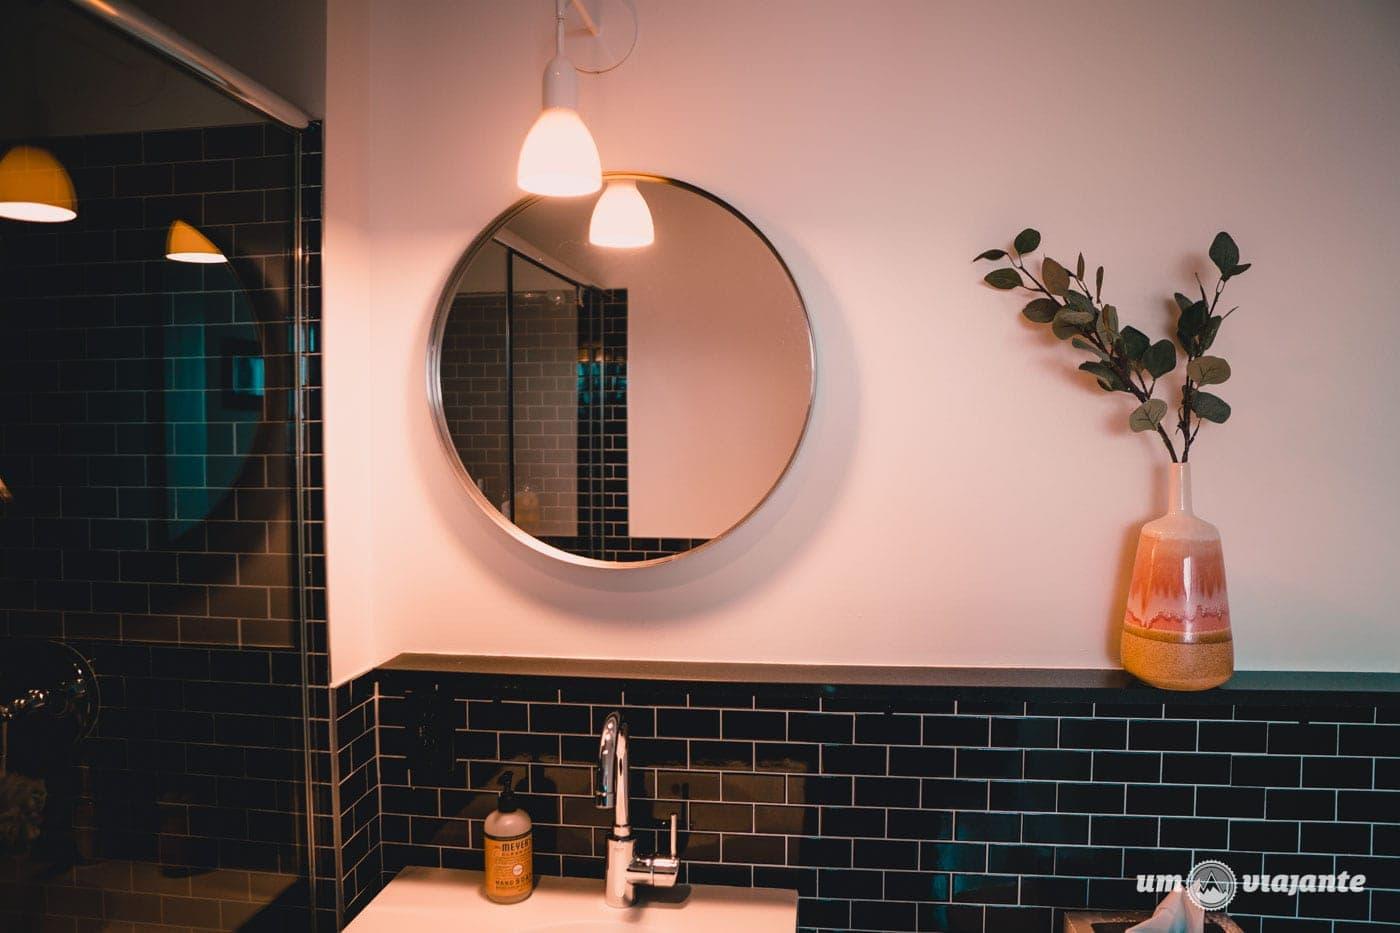 Banheiro do Airbnb